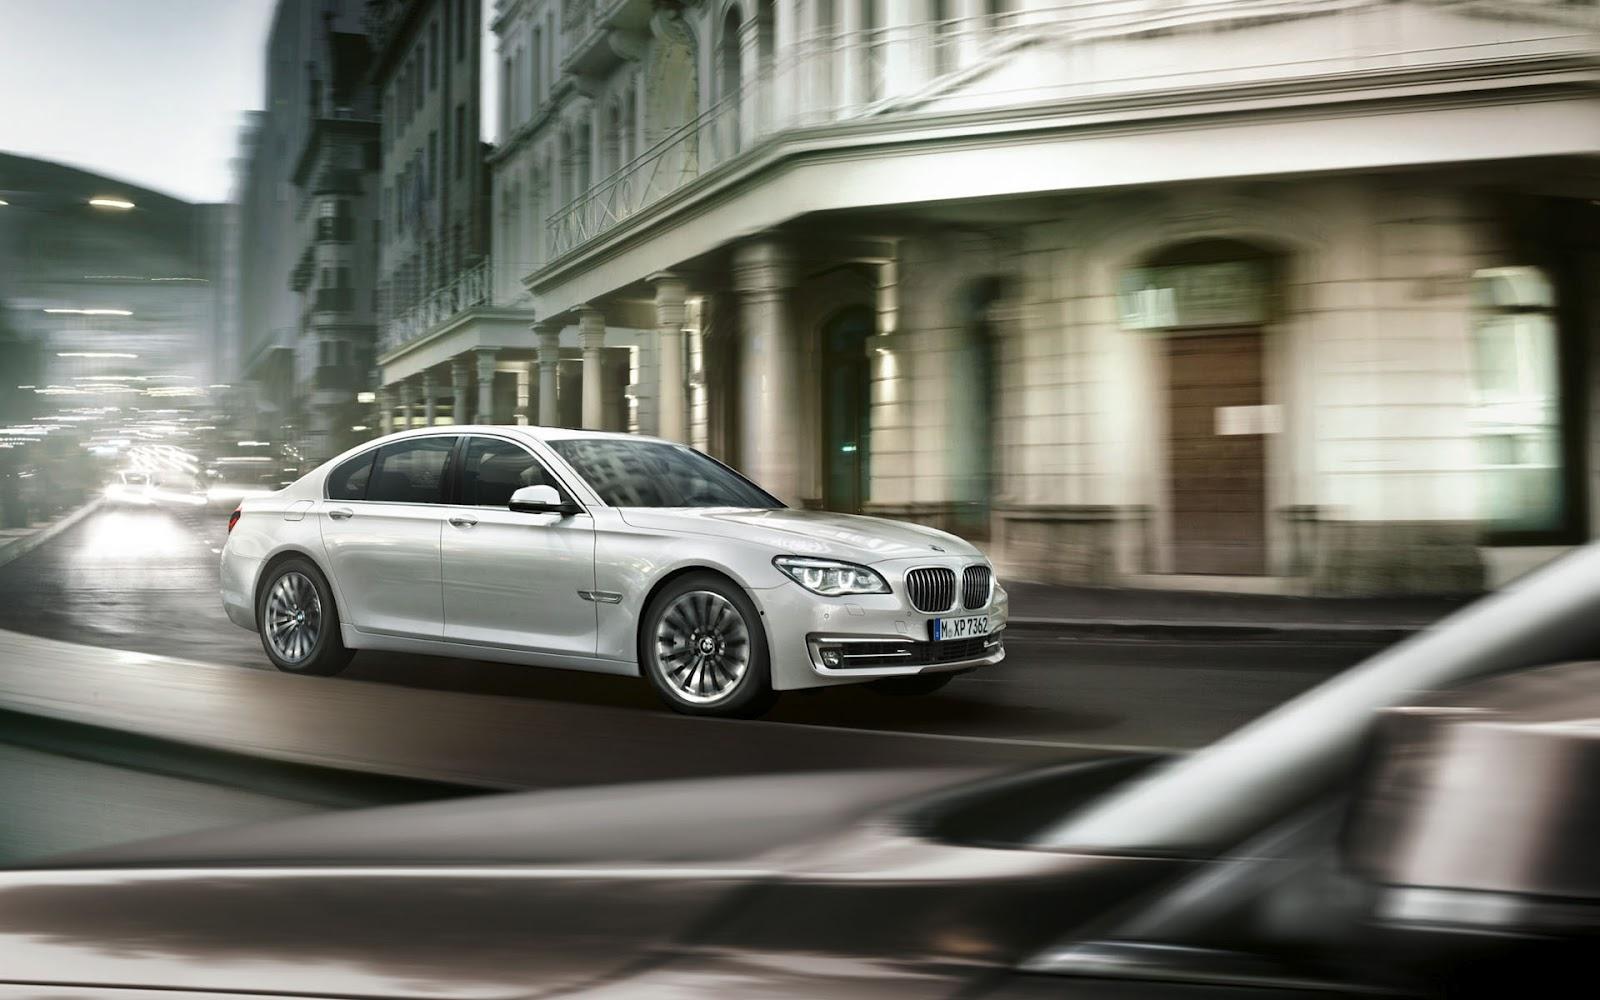 http://3.bp.blogspot.com/-IW7SSL3JSek/T8FD3OPn1sI/AAAAAAAABbo/TMKrk4mHPD4/s1600/BMW-7-Series-Wallpaper-07-1920x1200.jpg